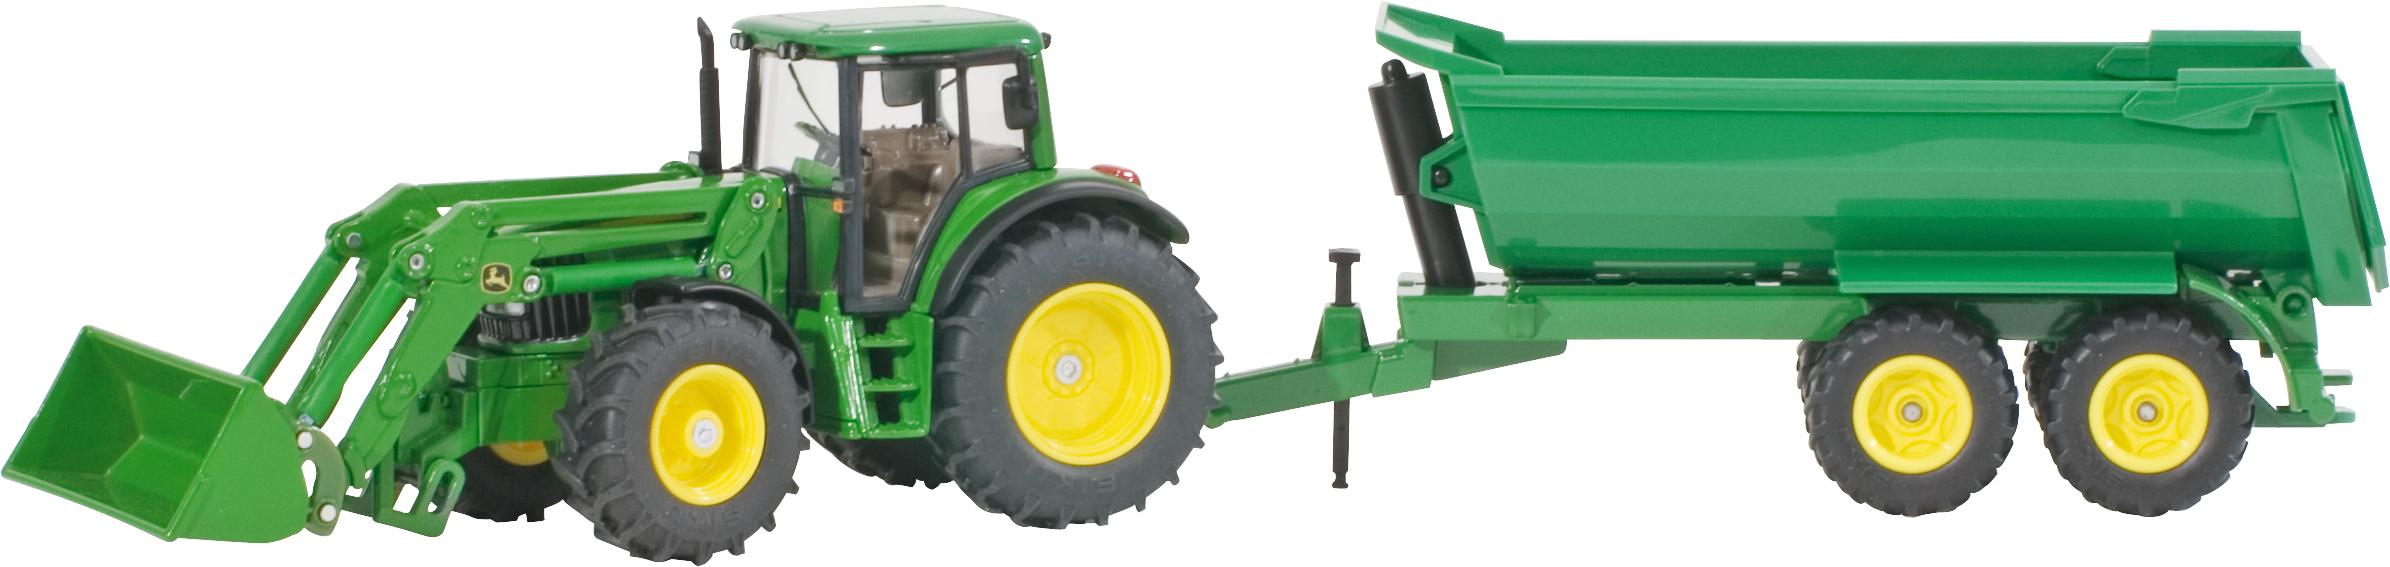 Traktor John Deere 6820